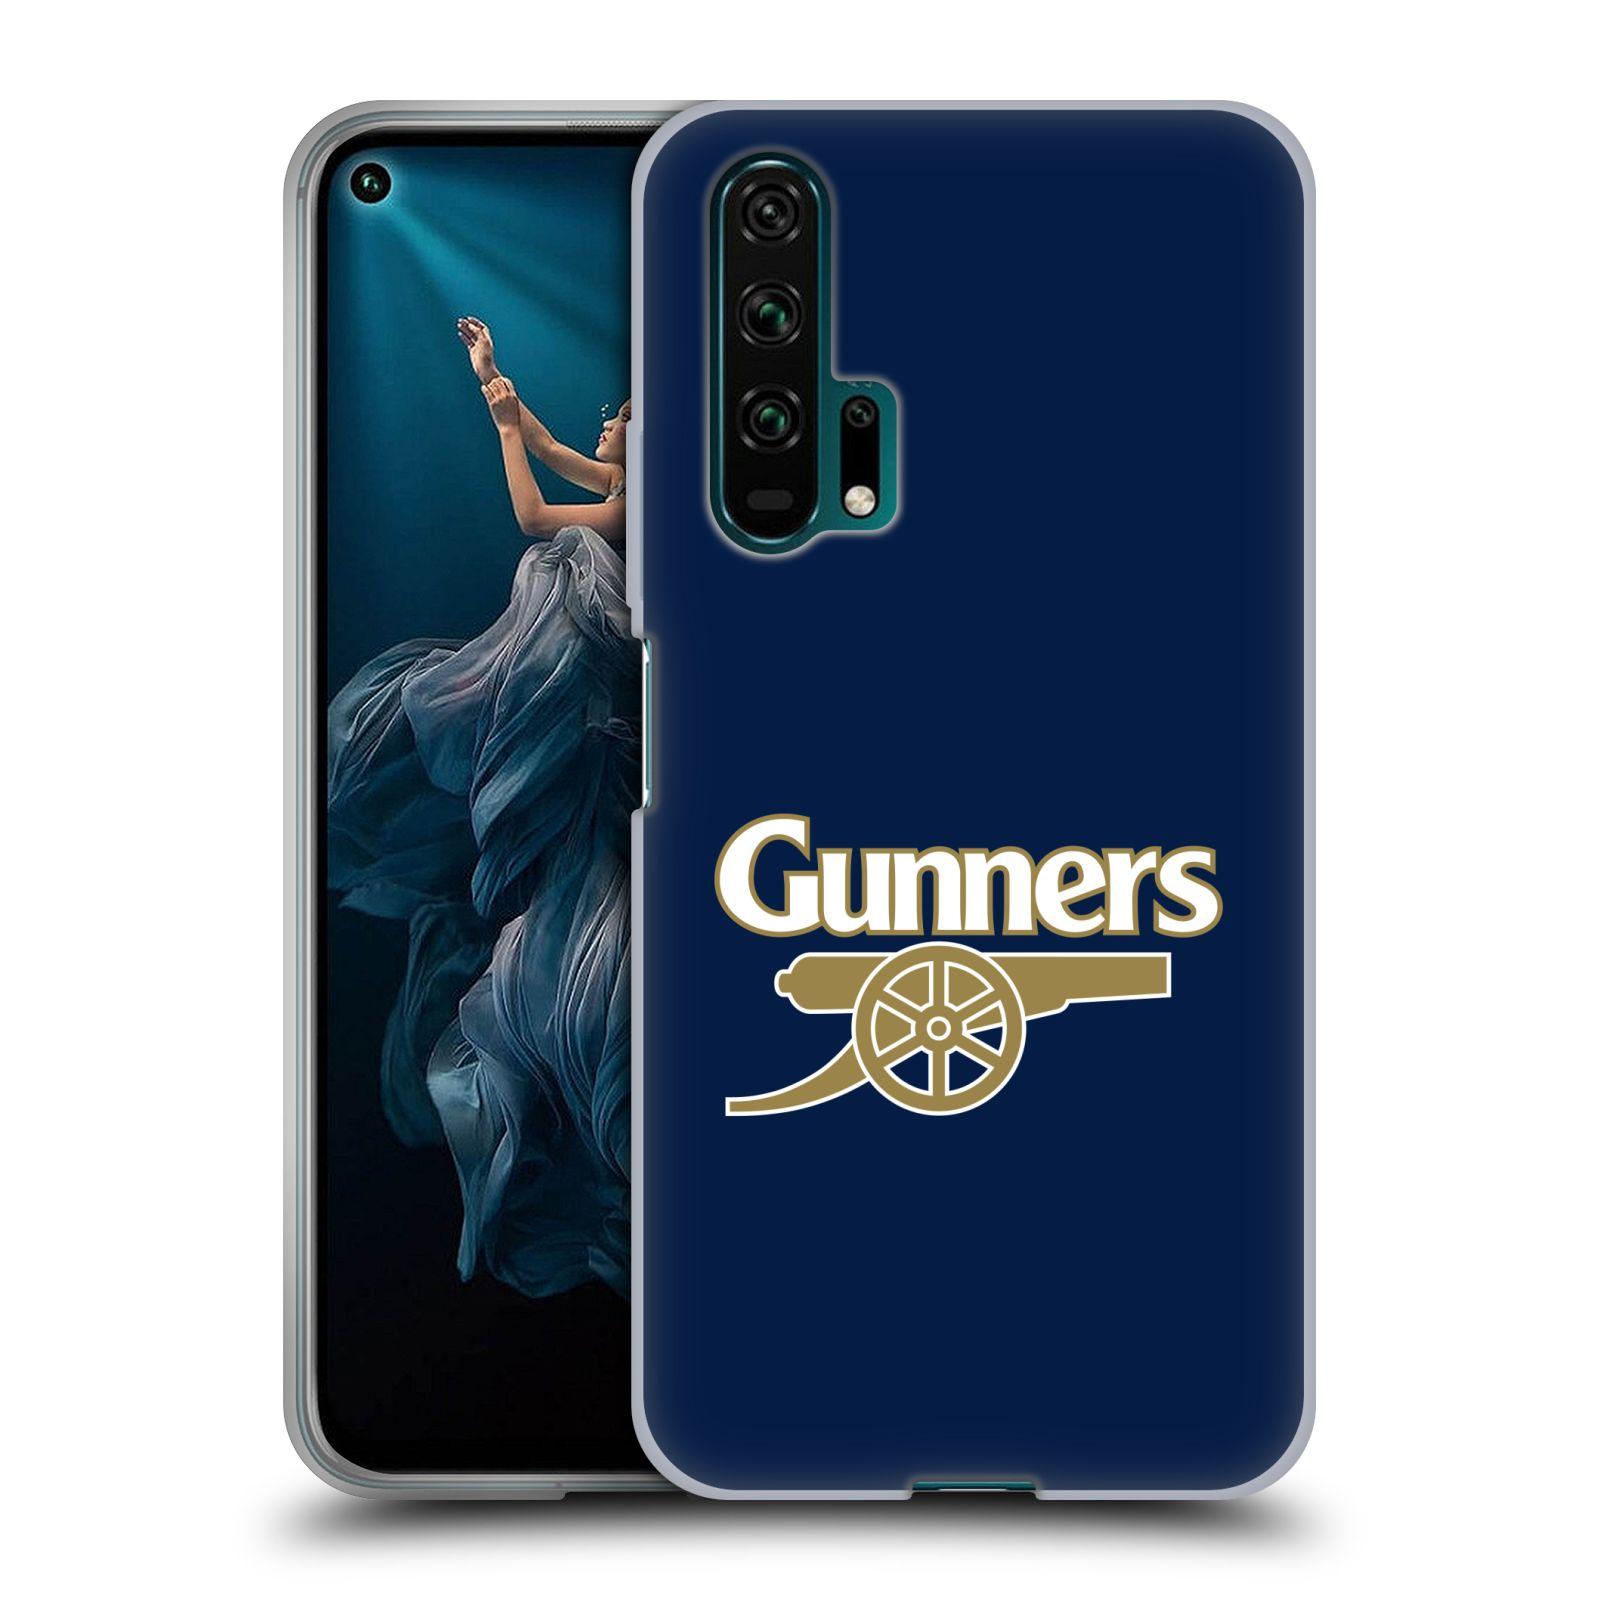 Silikonové pouzdro na mobil Honor 20 Pro - Head Case - Arsenal FC - Gunners